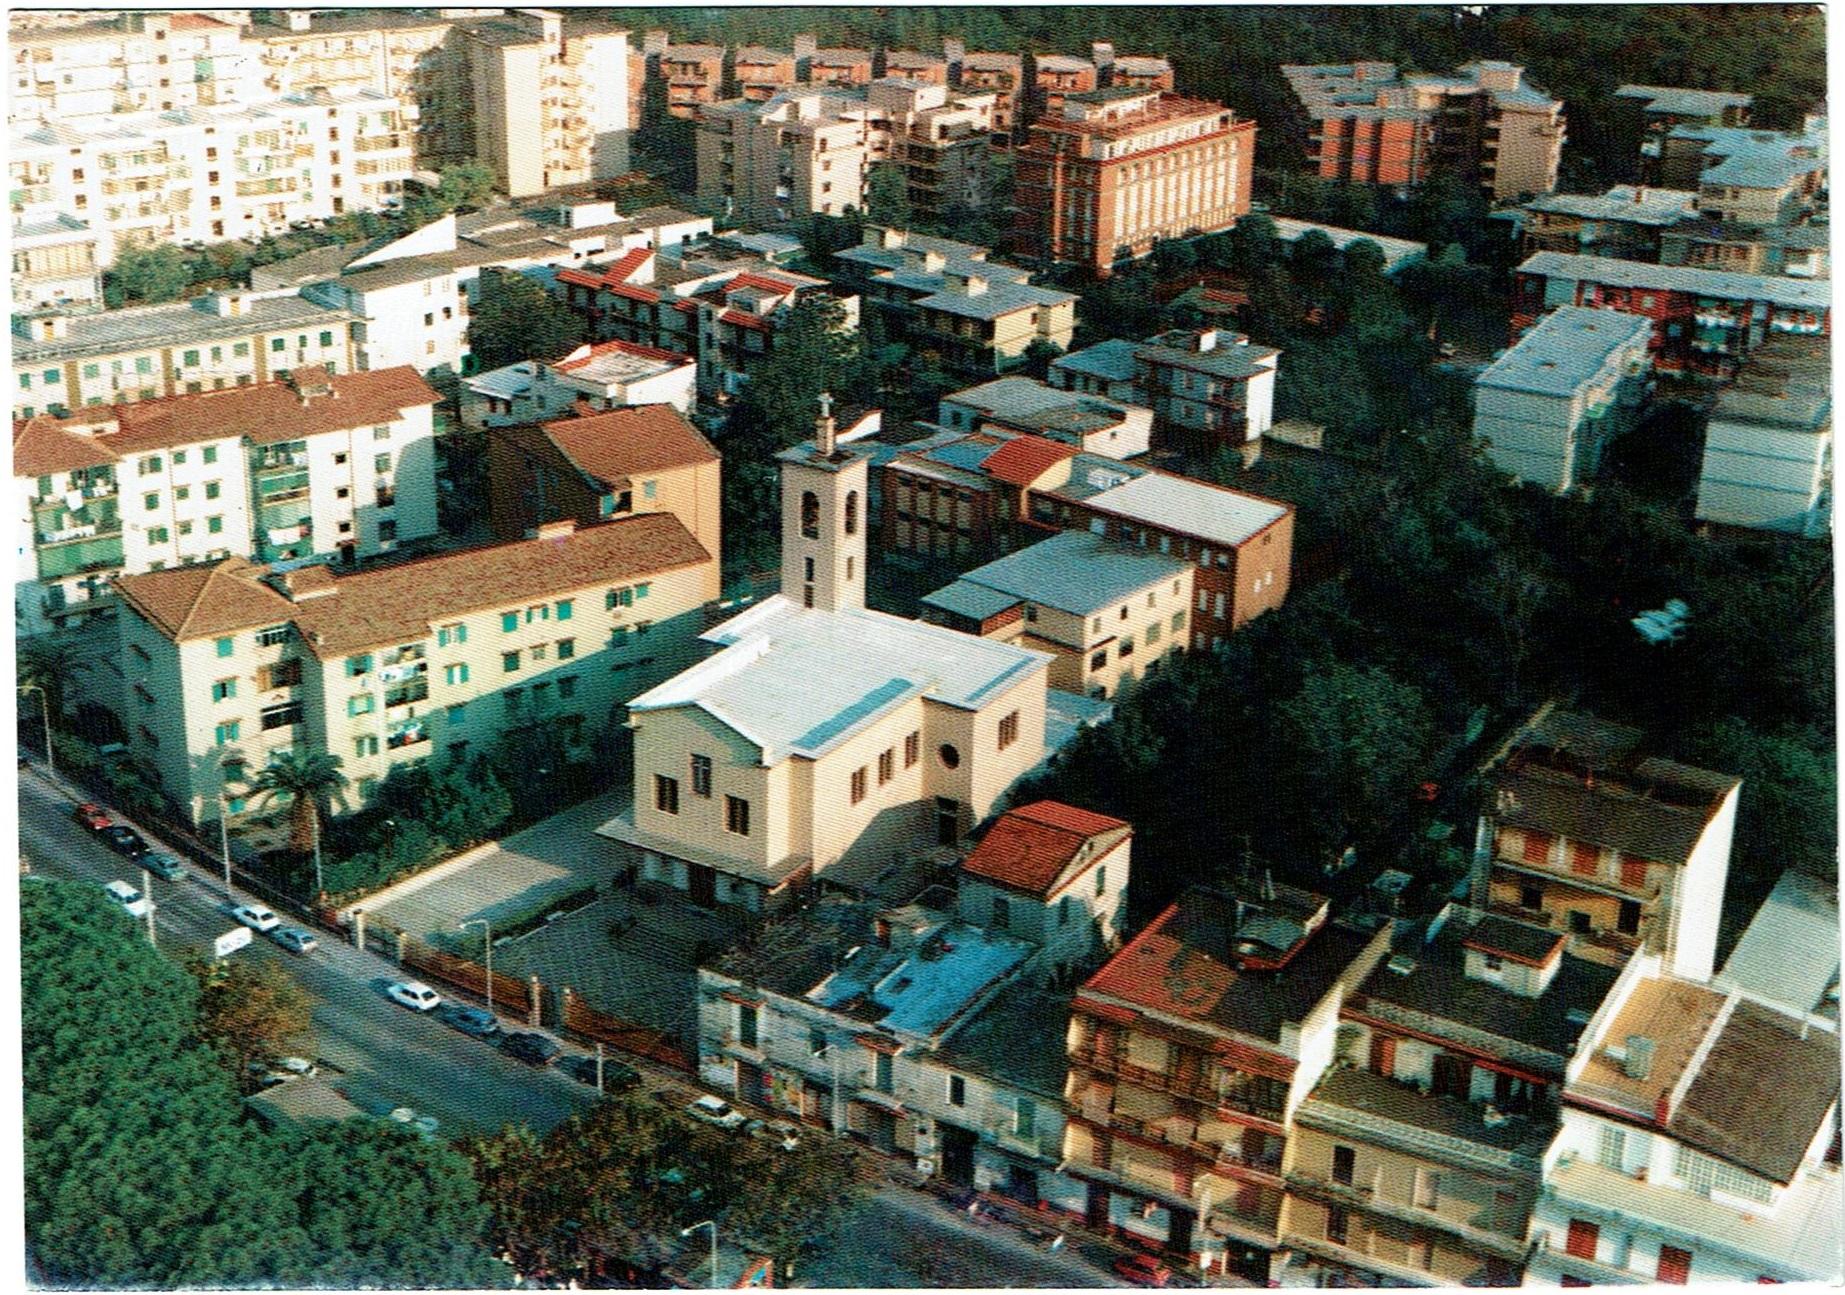 La Chiesa di San Marco Evangelista